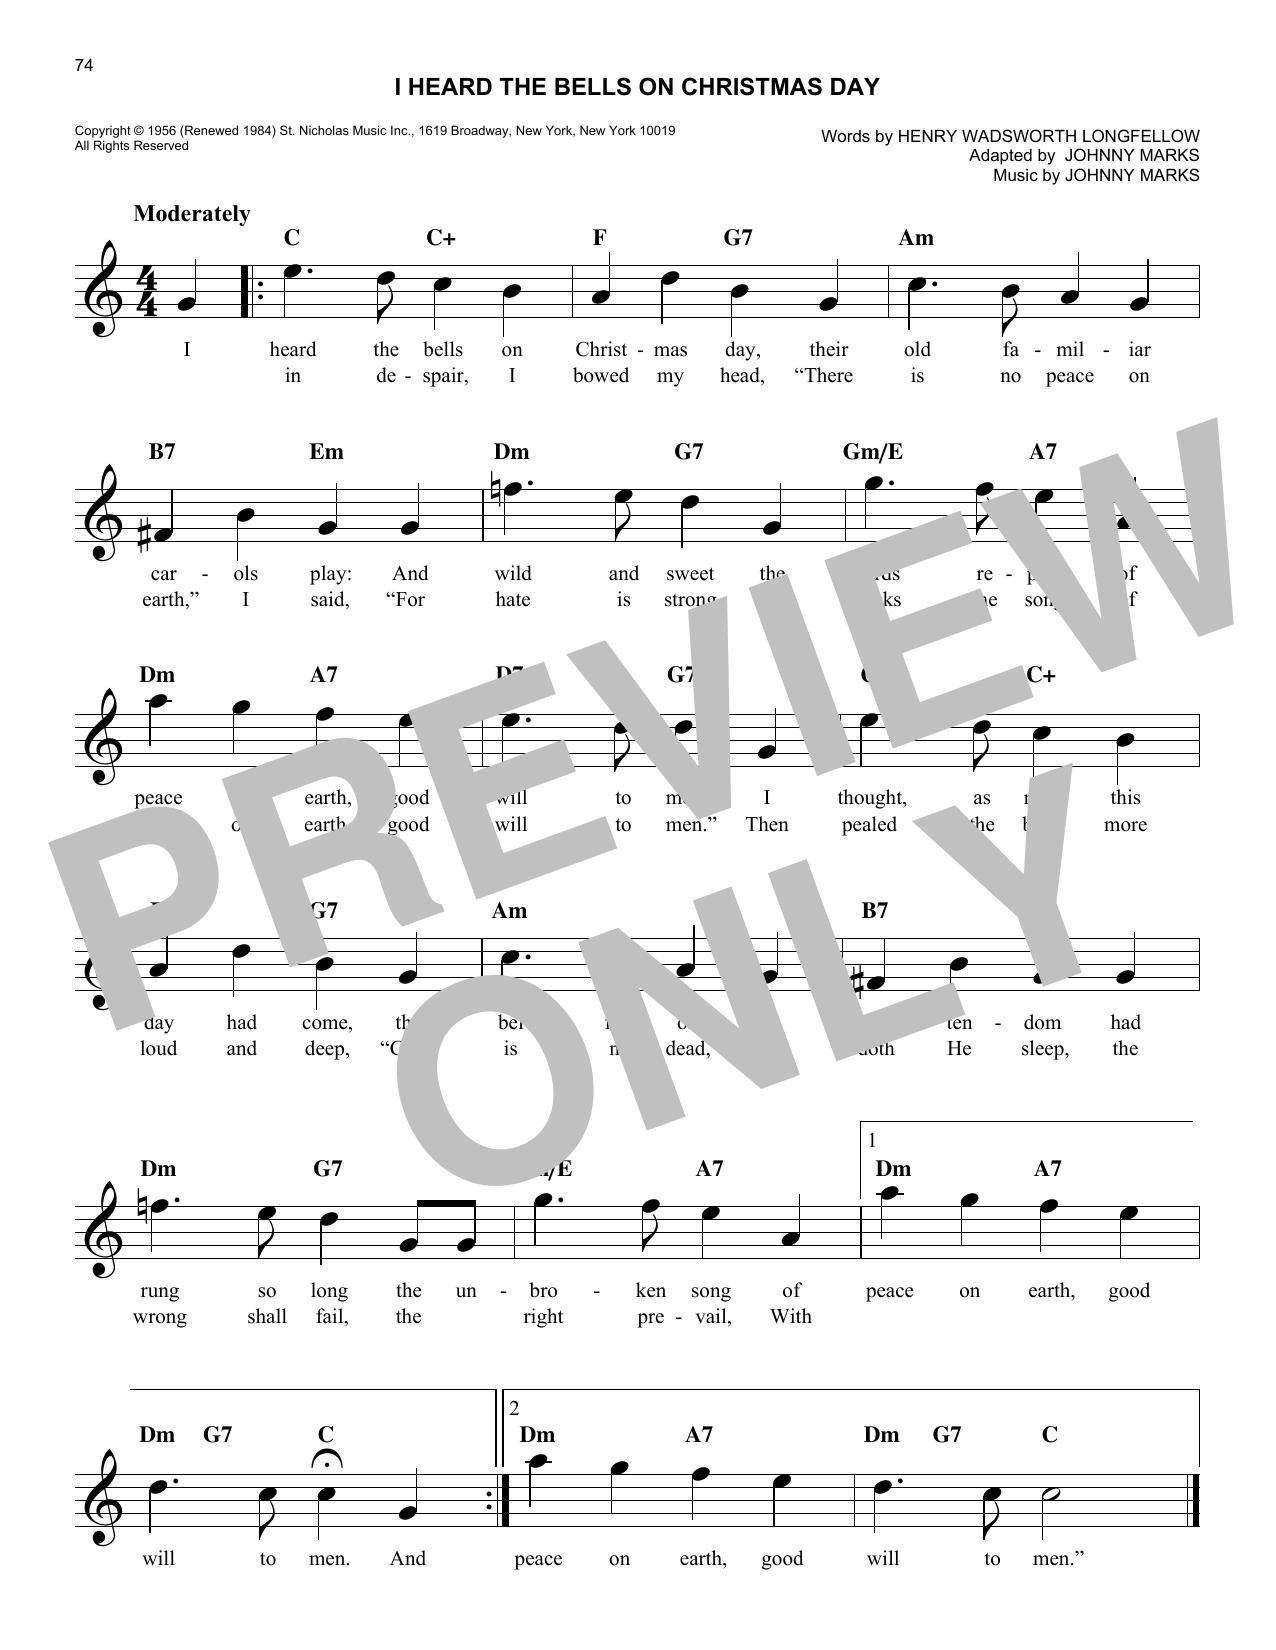 i heard the bells on christmas day sheet music - I Heard The Bells On Christmas Day Lyrics